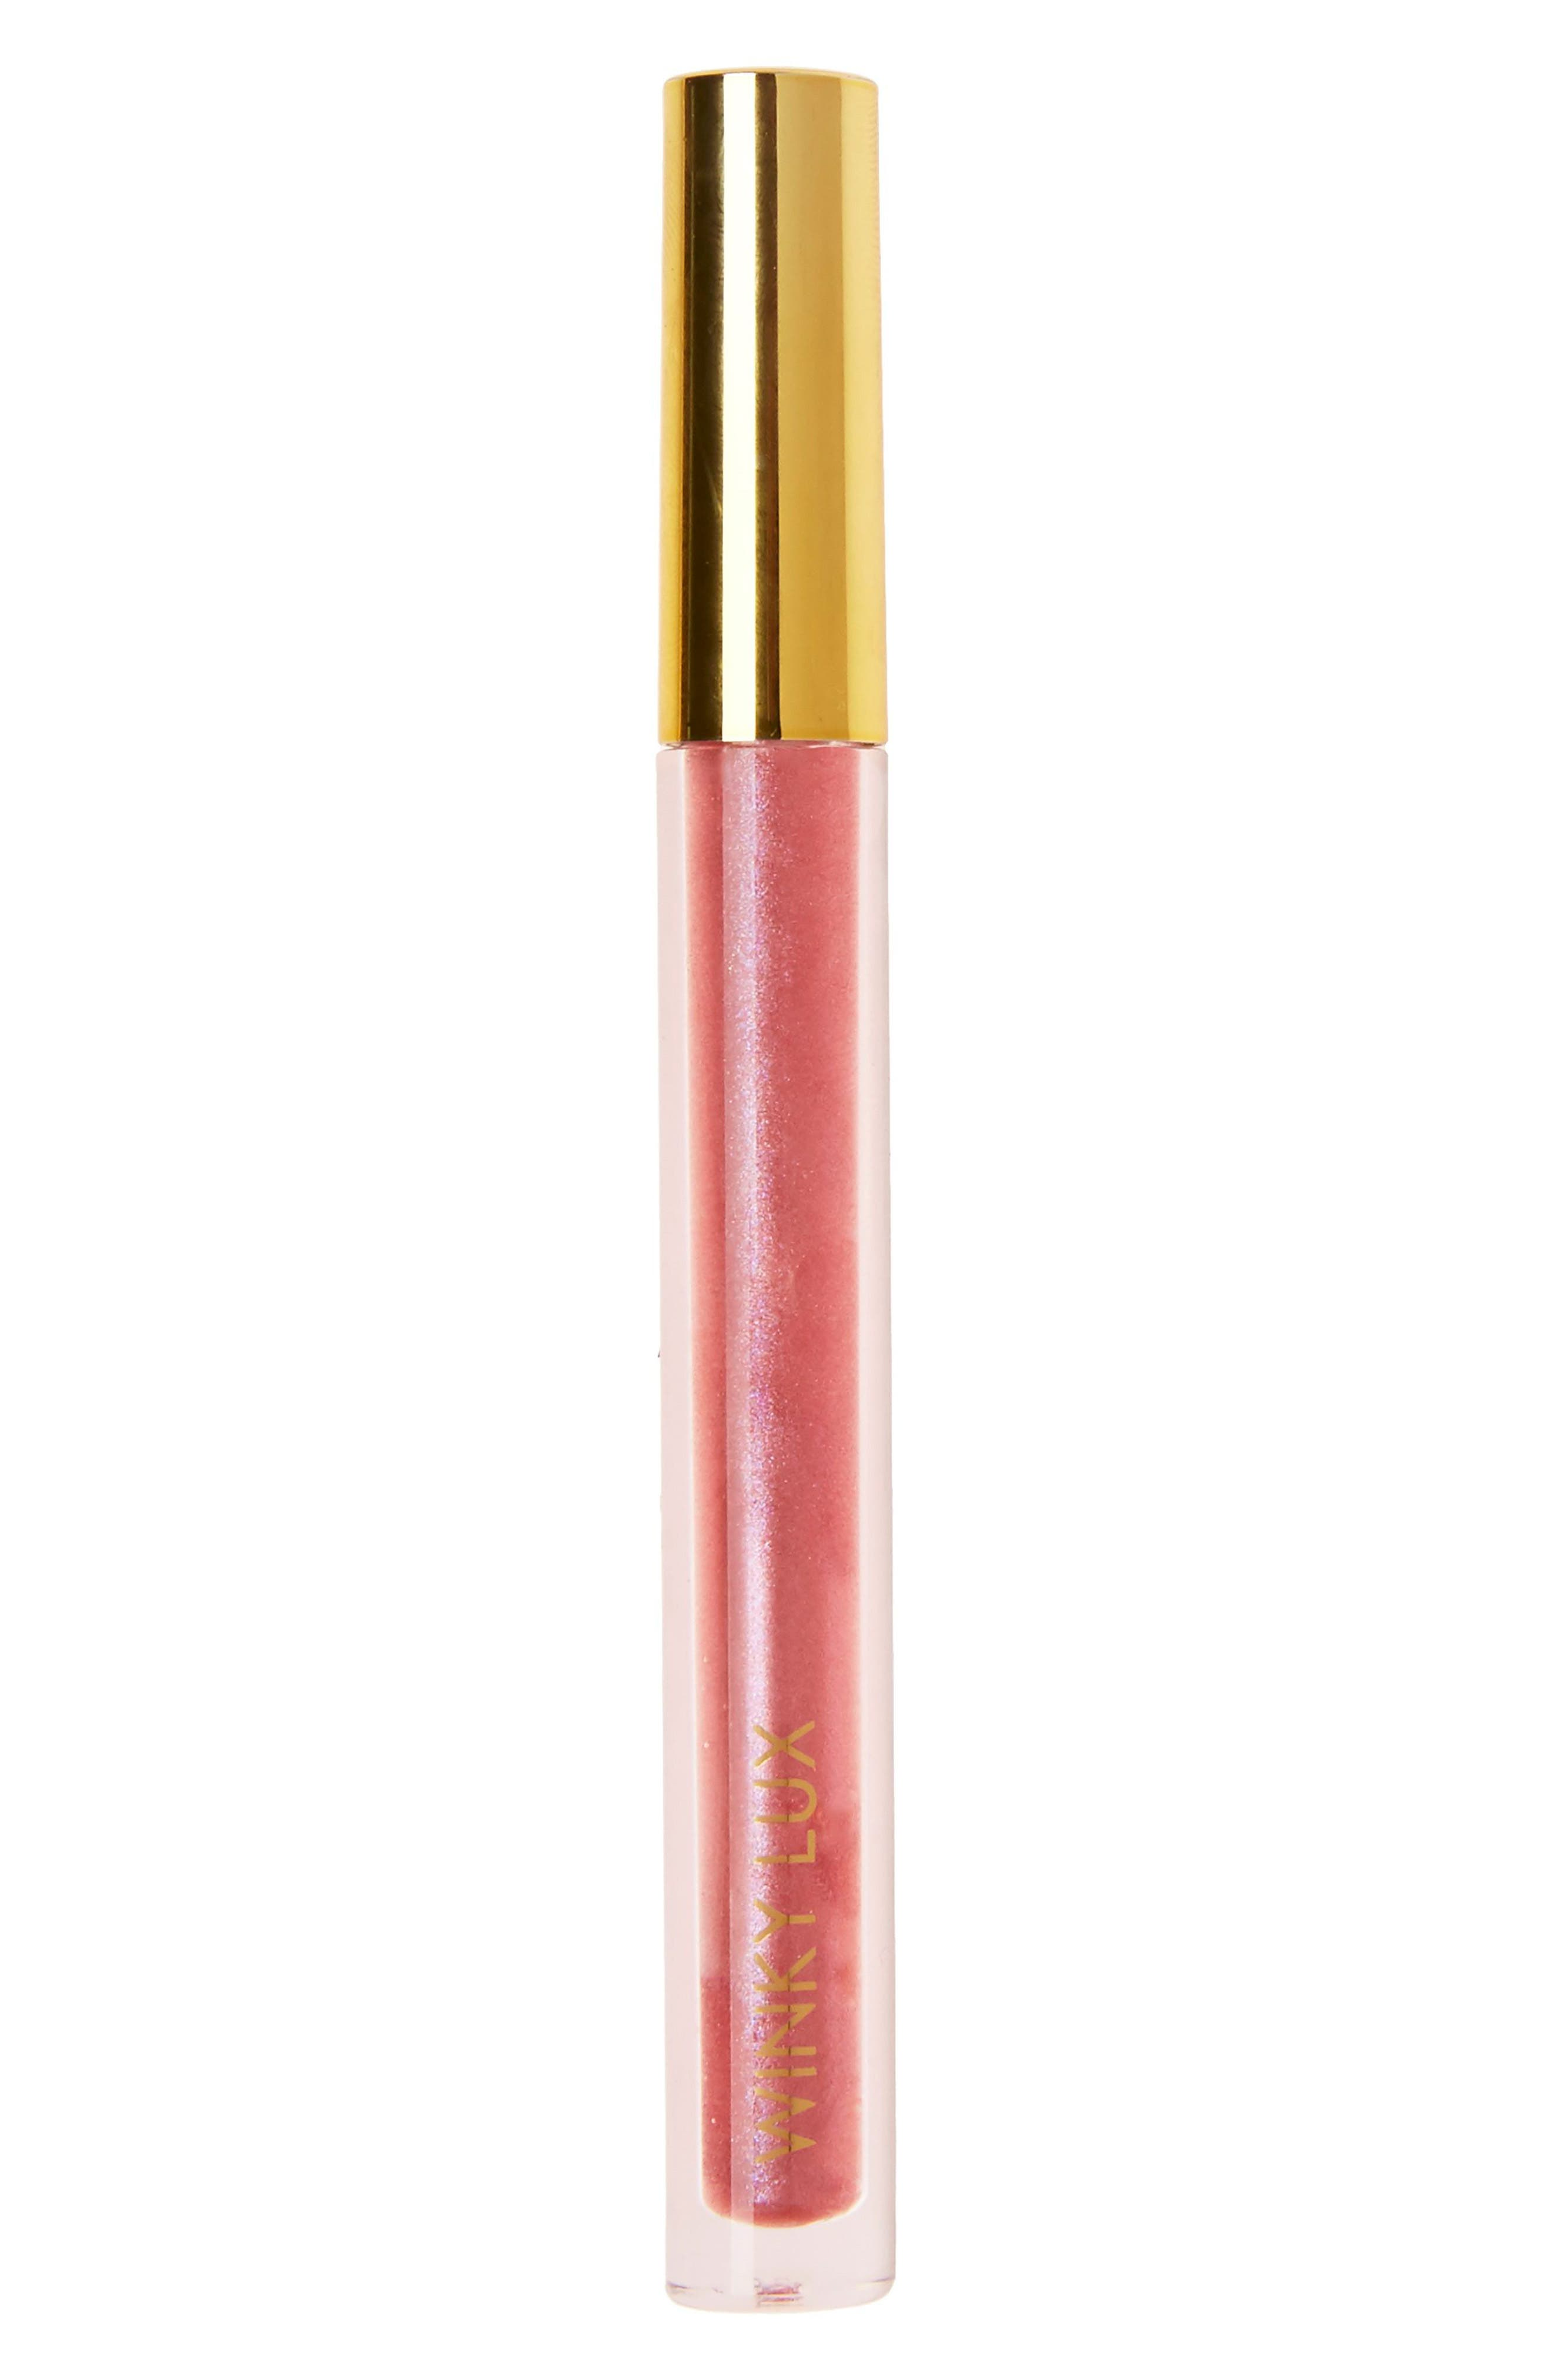 Glazed Donut Lip Gloss,                             Main thumbnail 1, color,                             Cherry Glaze